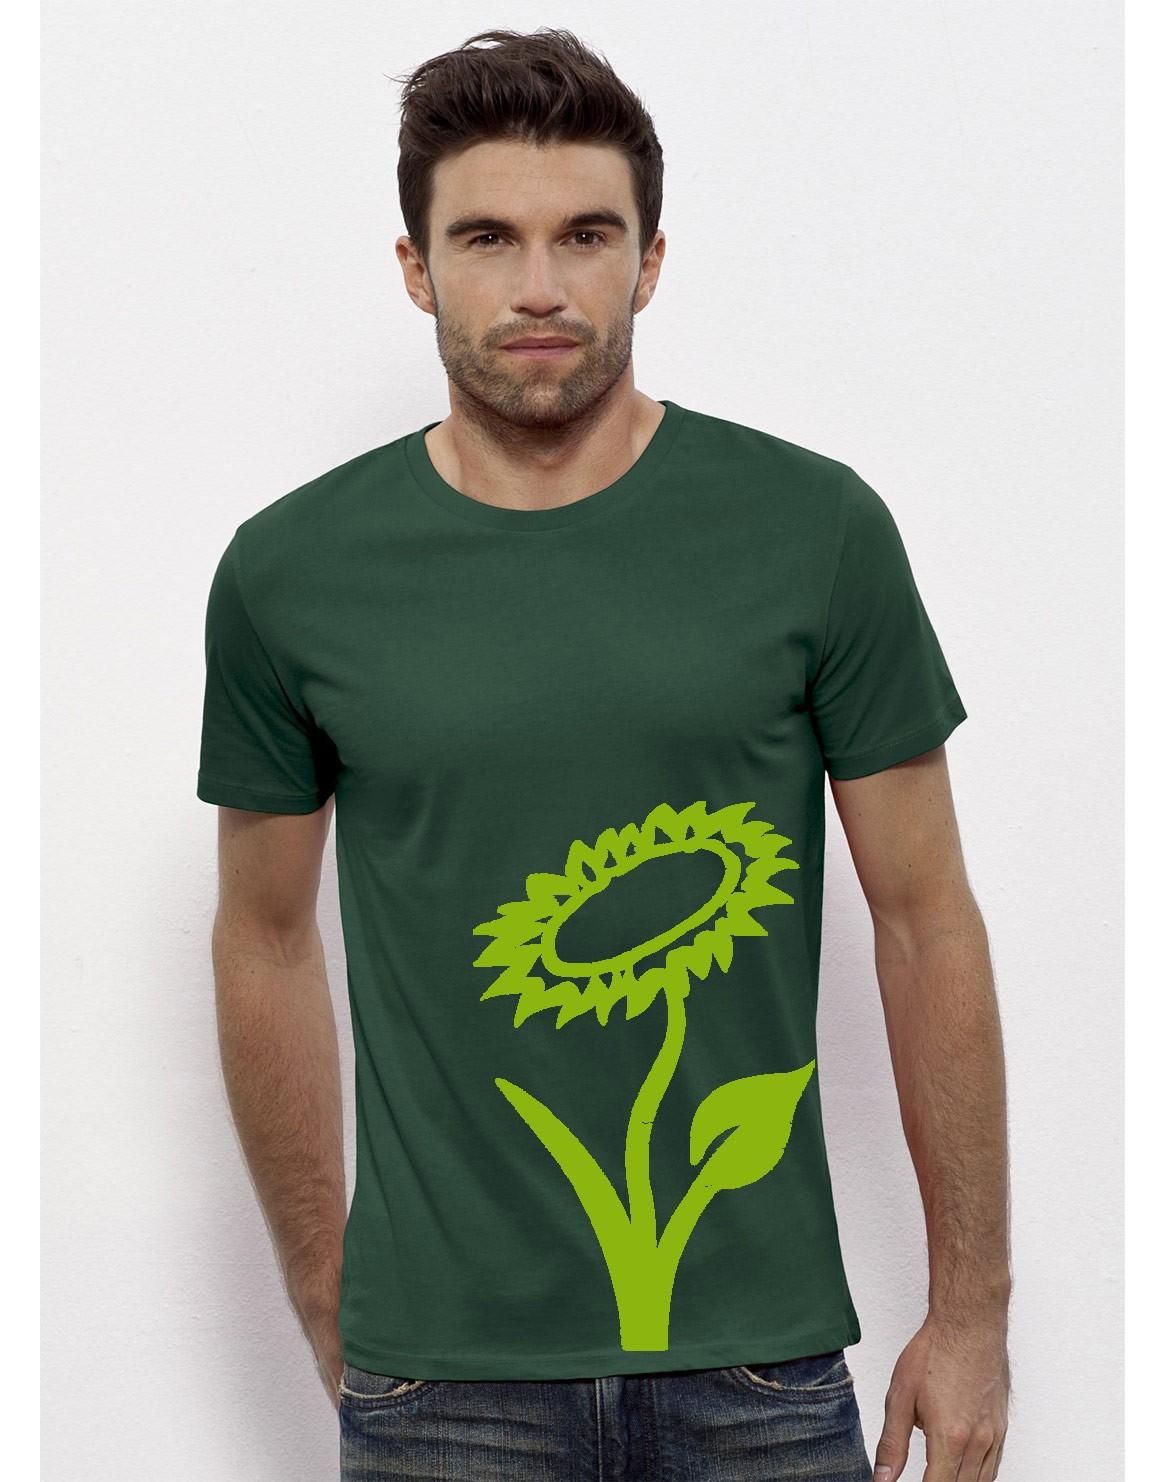 Vlower T-Shirt Grün-Grün